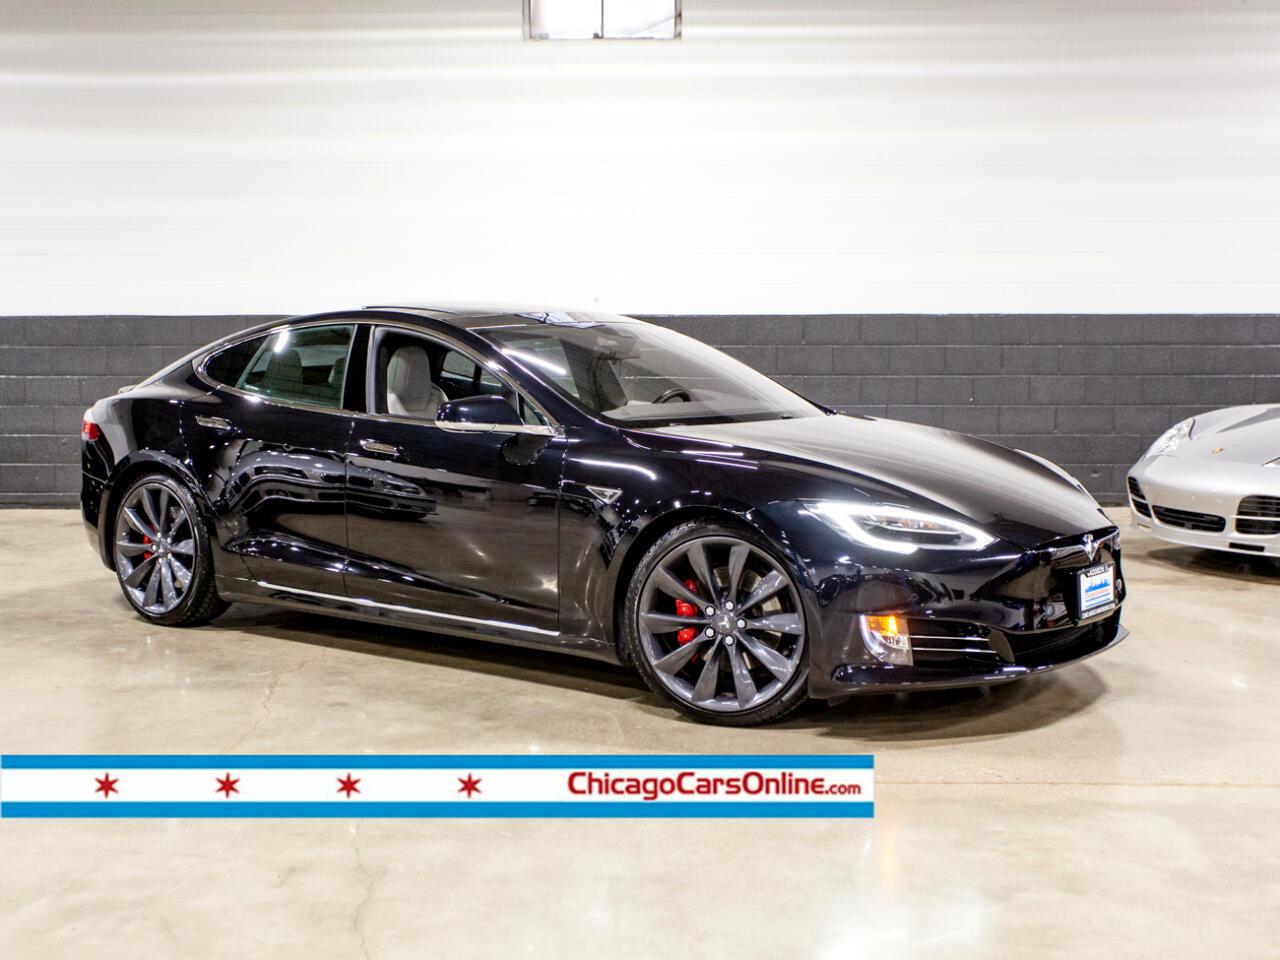 2016 Tesla Model S 2016.5 4Dr Sdn P90D Ludicrous